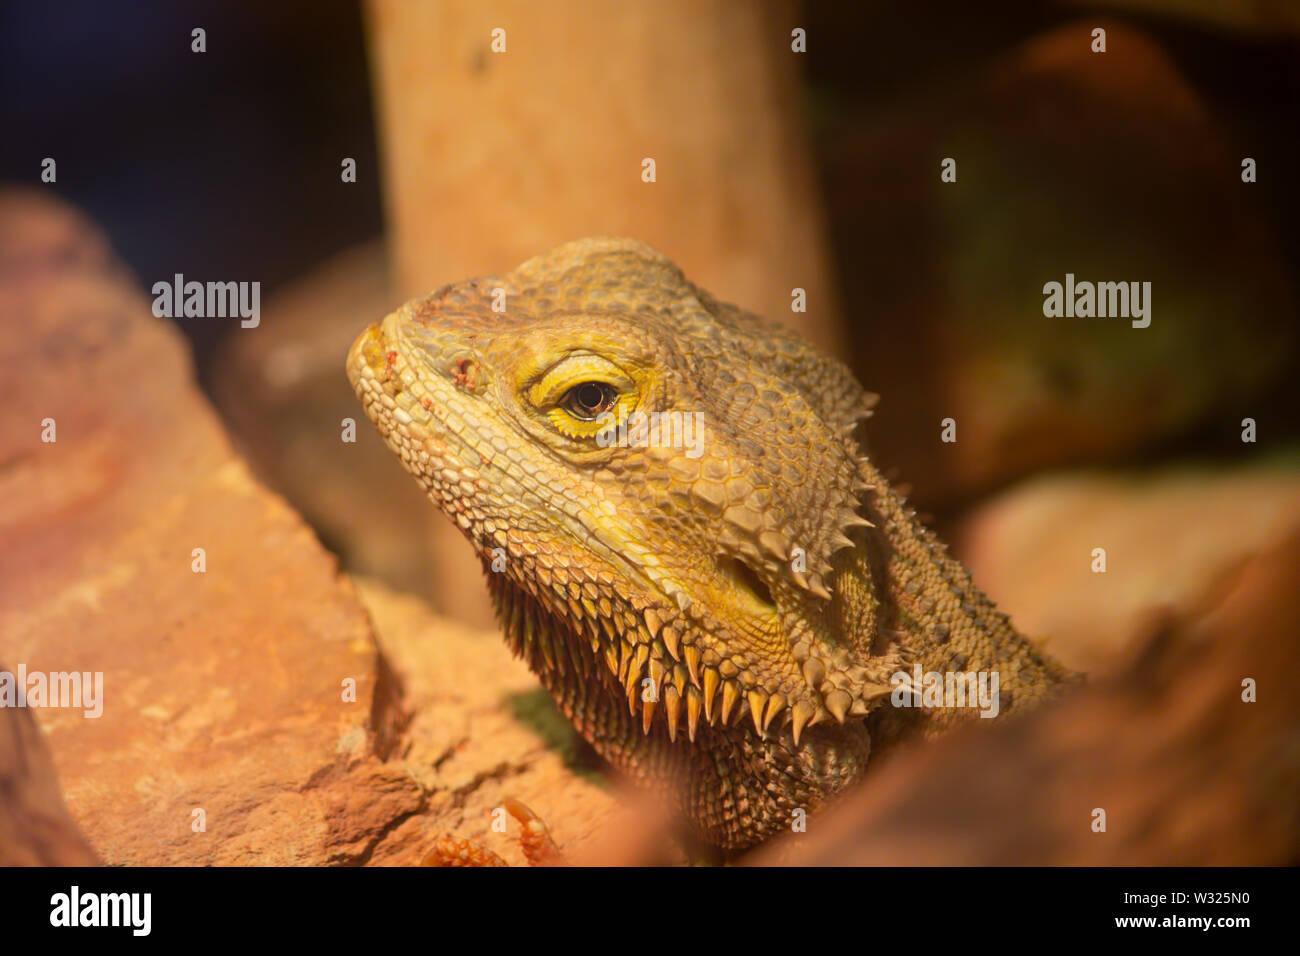 Bearded Dragon Pogona Close Up Face - Stock Image